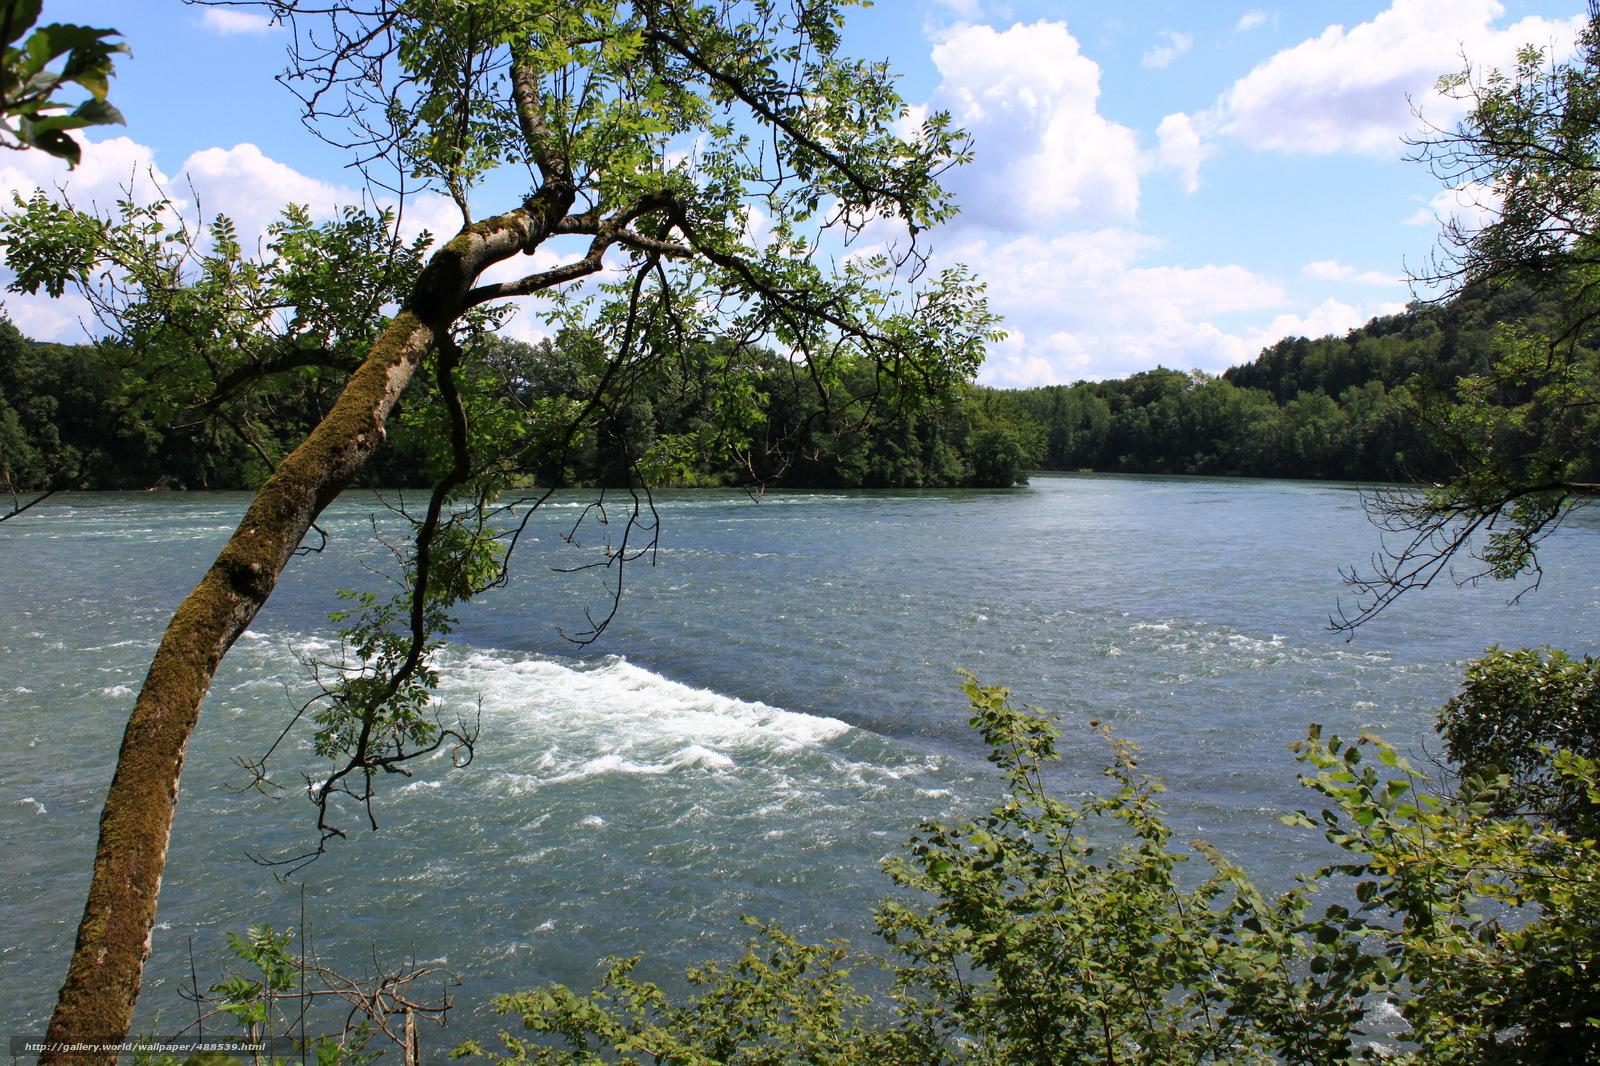 Download wallpaper River,  switzerland,  rietheim rhine,  Trees free desktop wallpaper in the resolution 2972x1981 — picture №488539